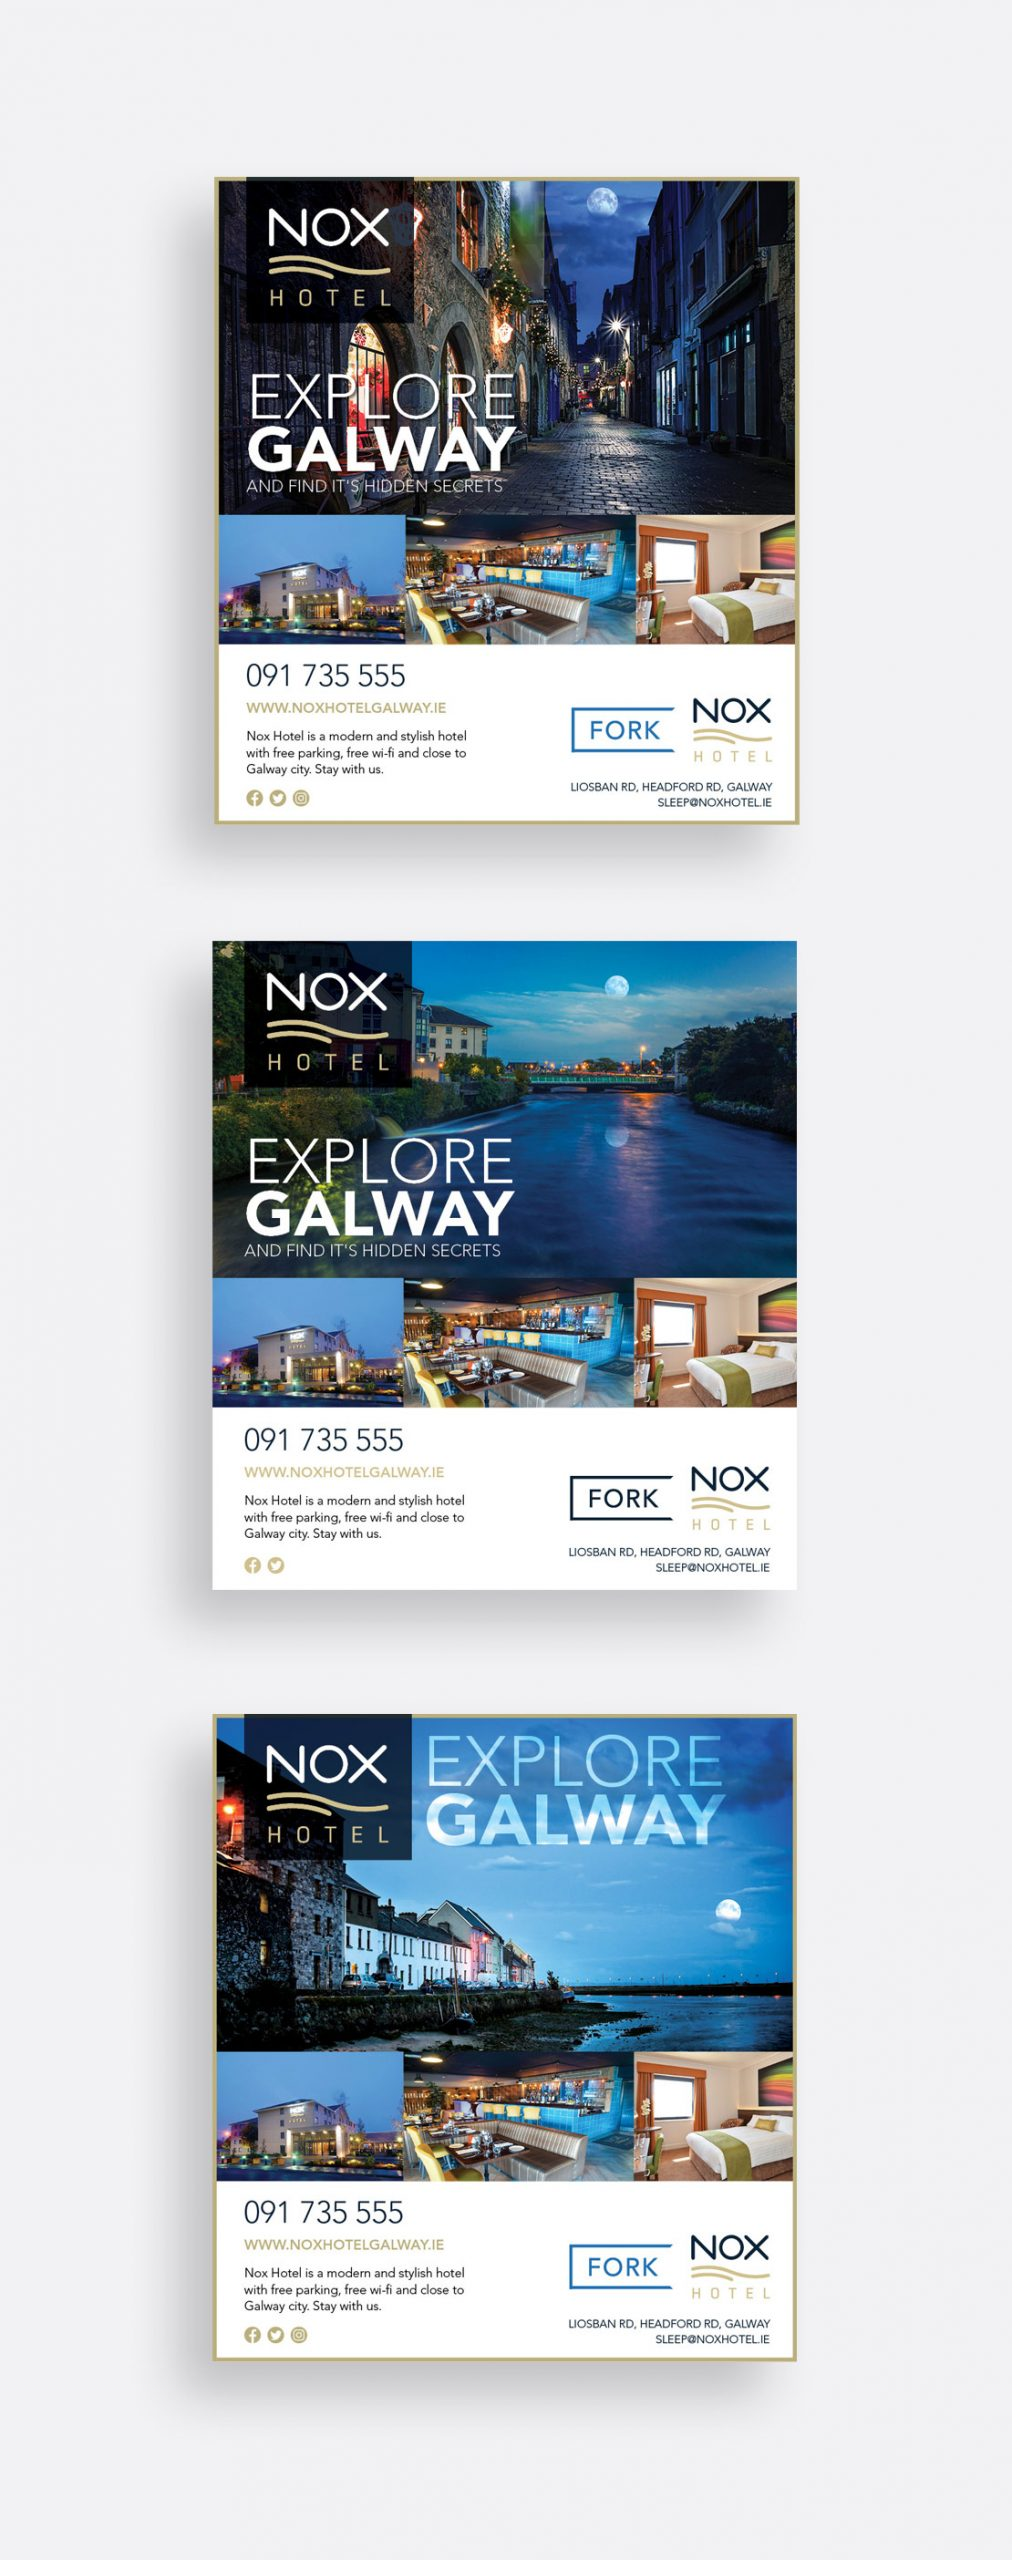 Nox Hotel 'Explore Galway' print campaign